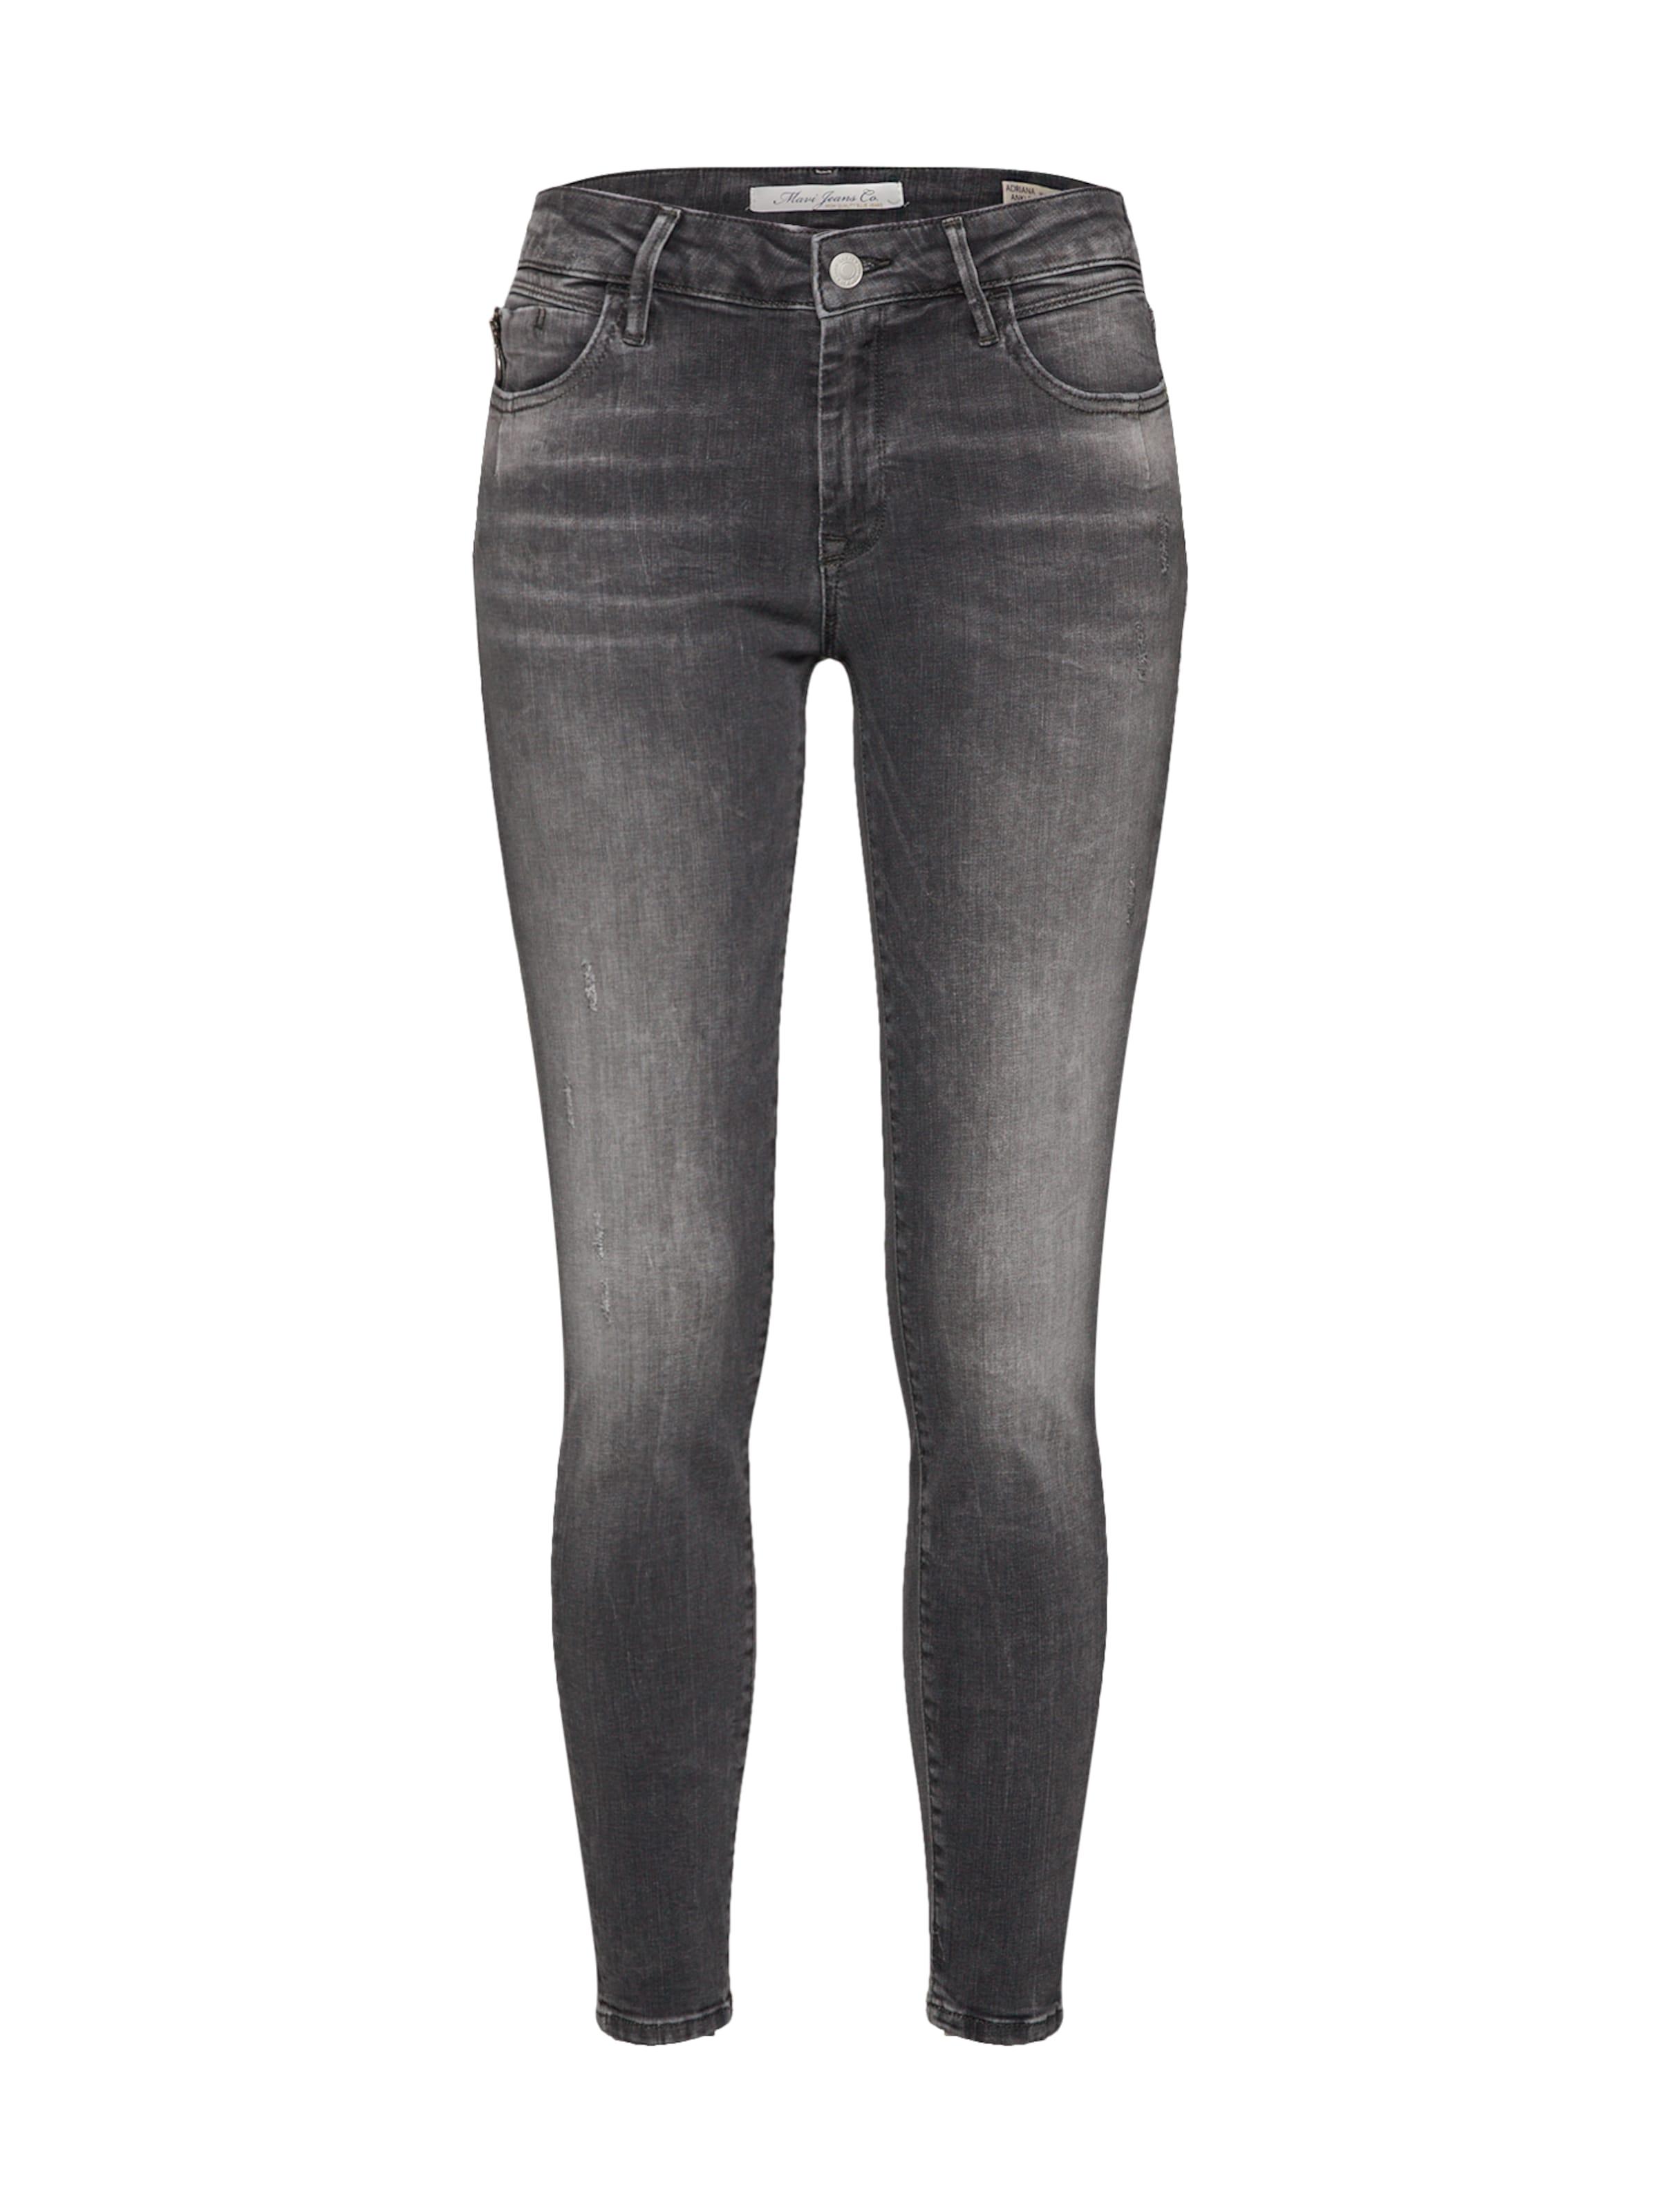 'adriana' In Jeans Mavi Mavi Dunkelgrau 6yfYb7g